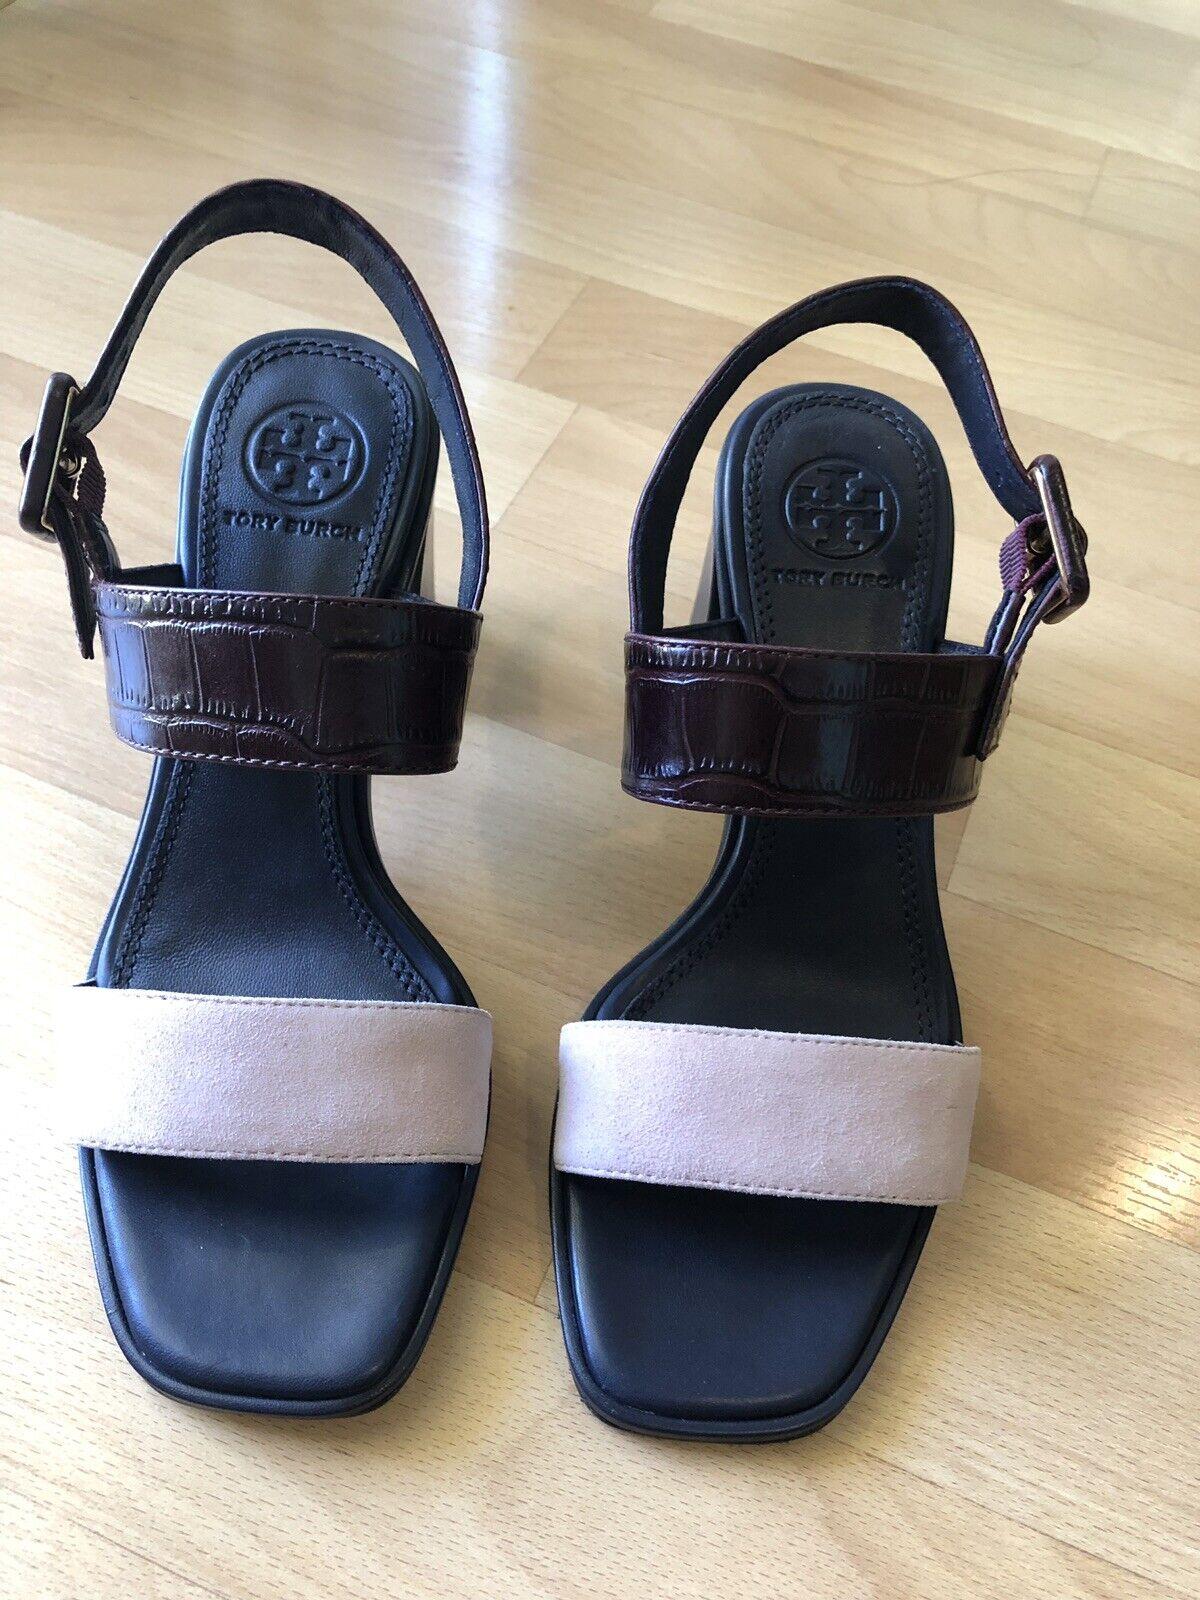 New Tory Burch Delaney Women's Sz 5.5M Pink Malbec Leather Heel Sandals